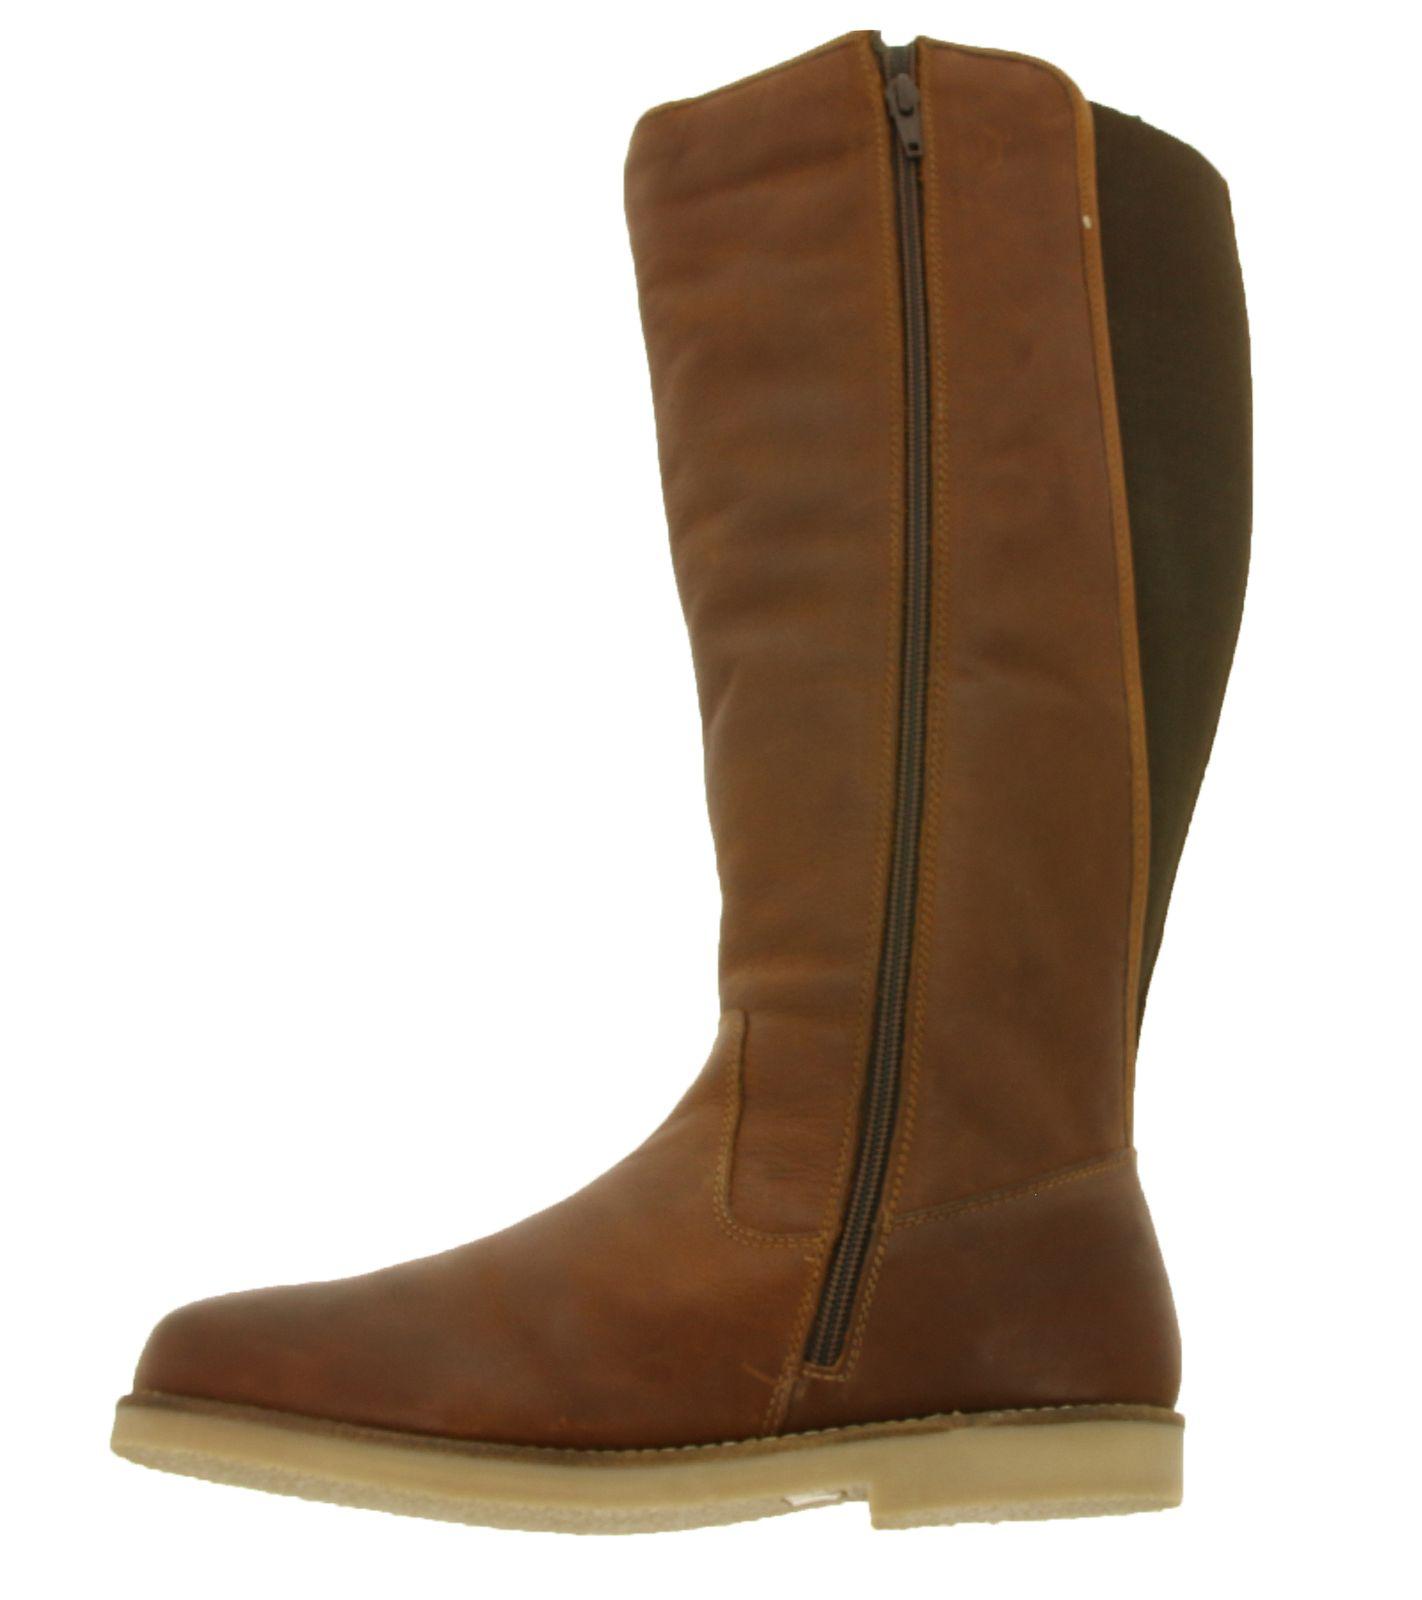 Im Günstige Modeamp; Marken Online O46 Schuhe OutletOutlet46 54RLA3j